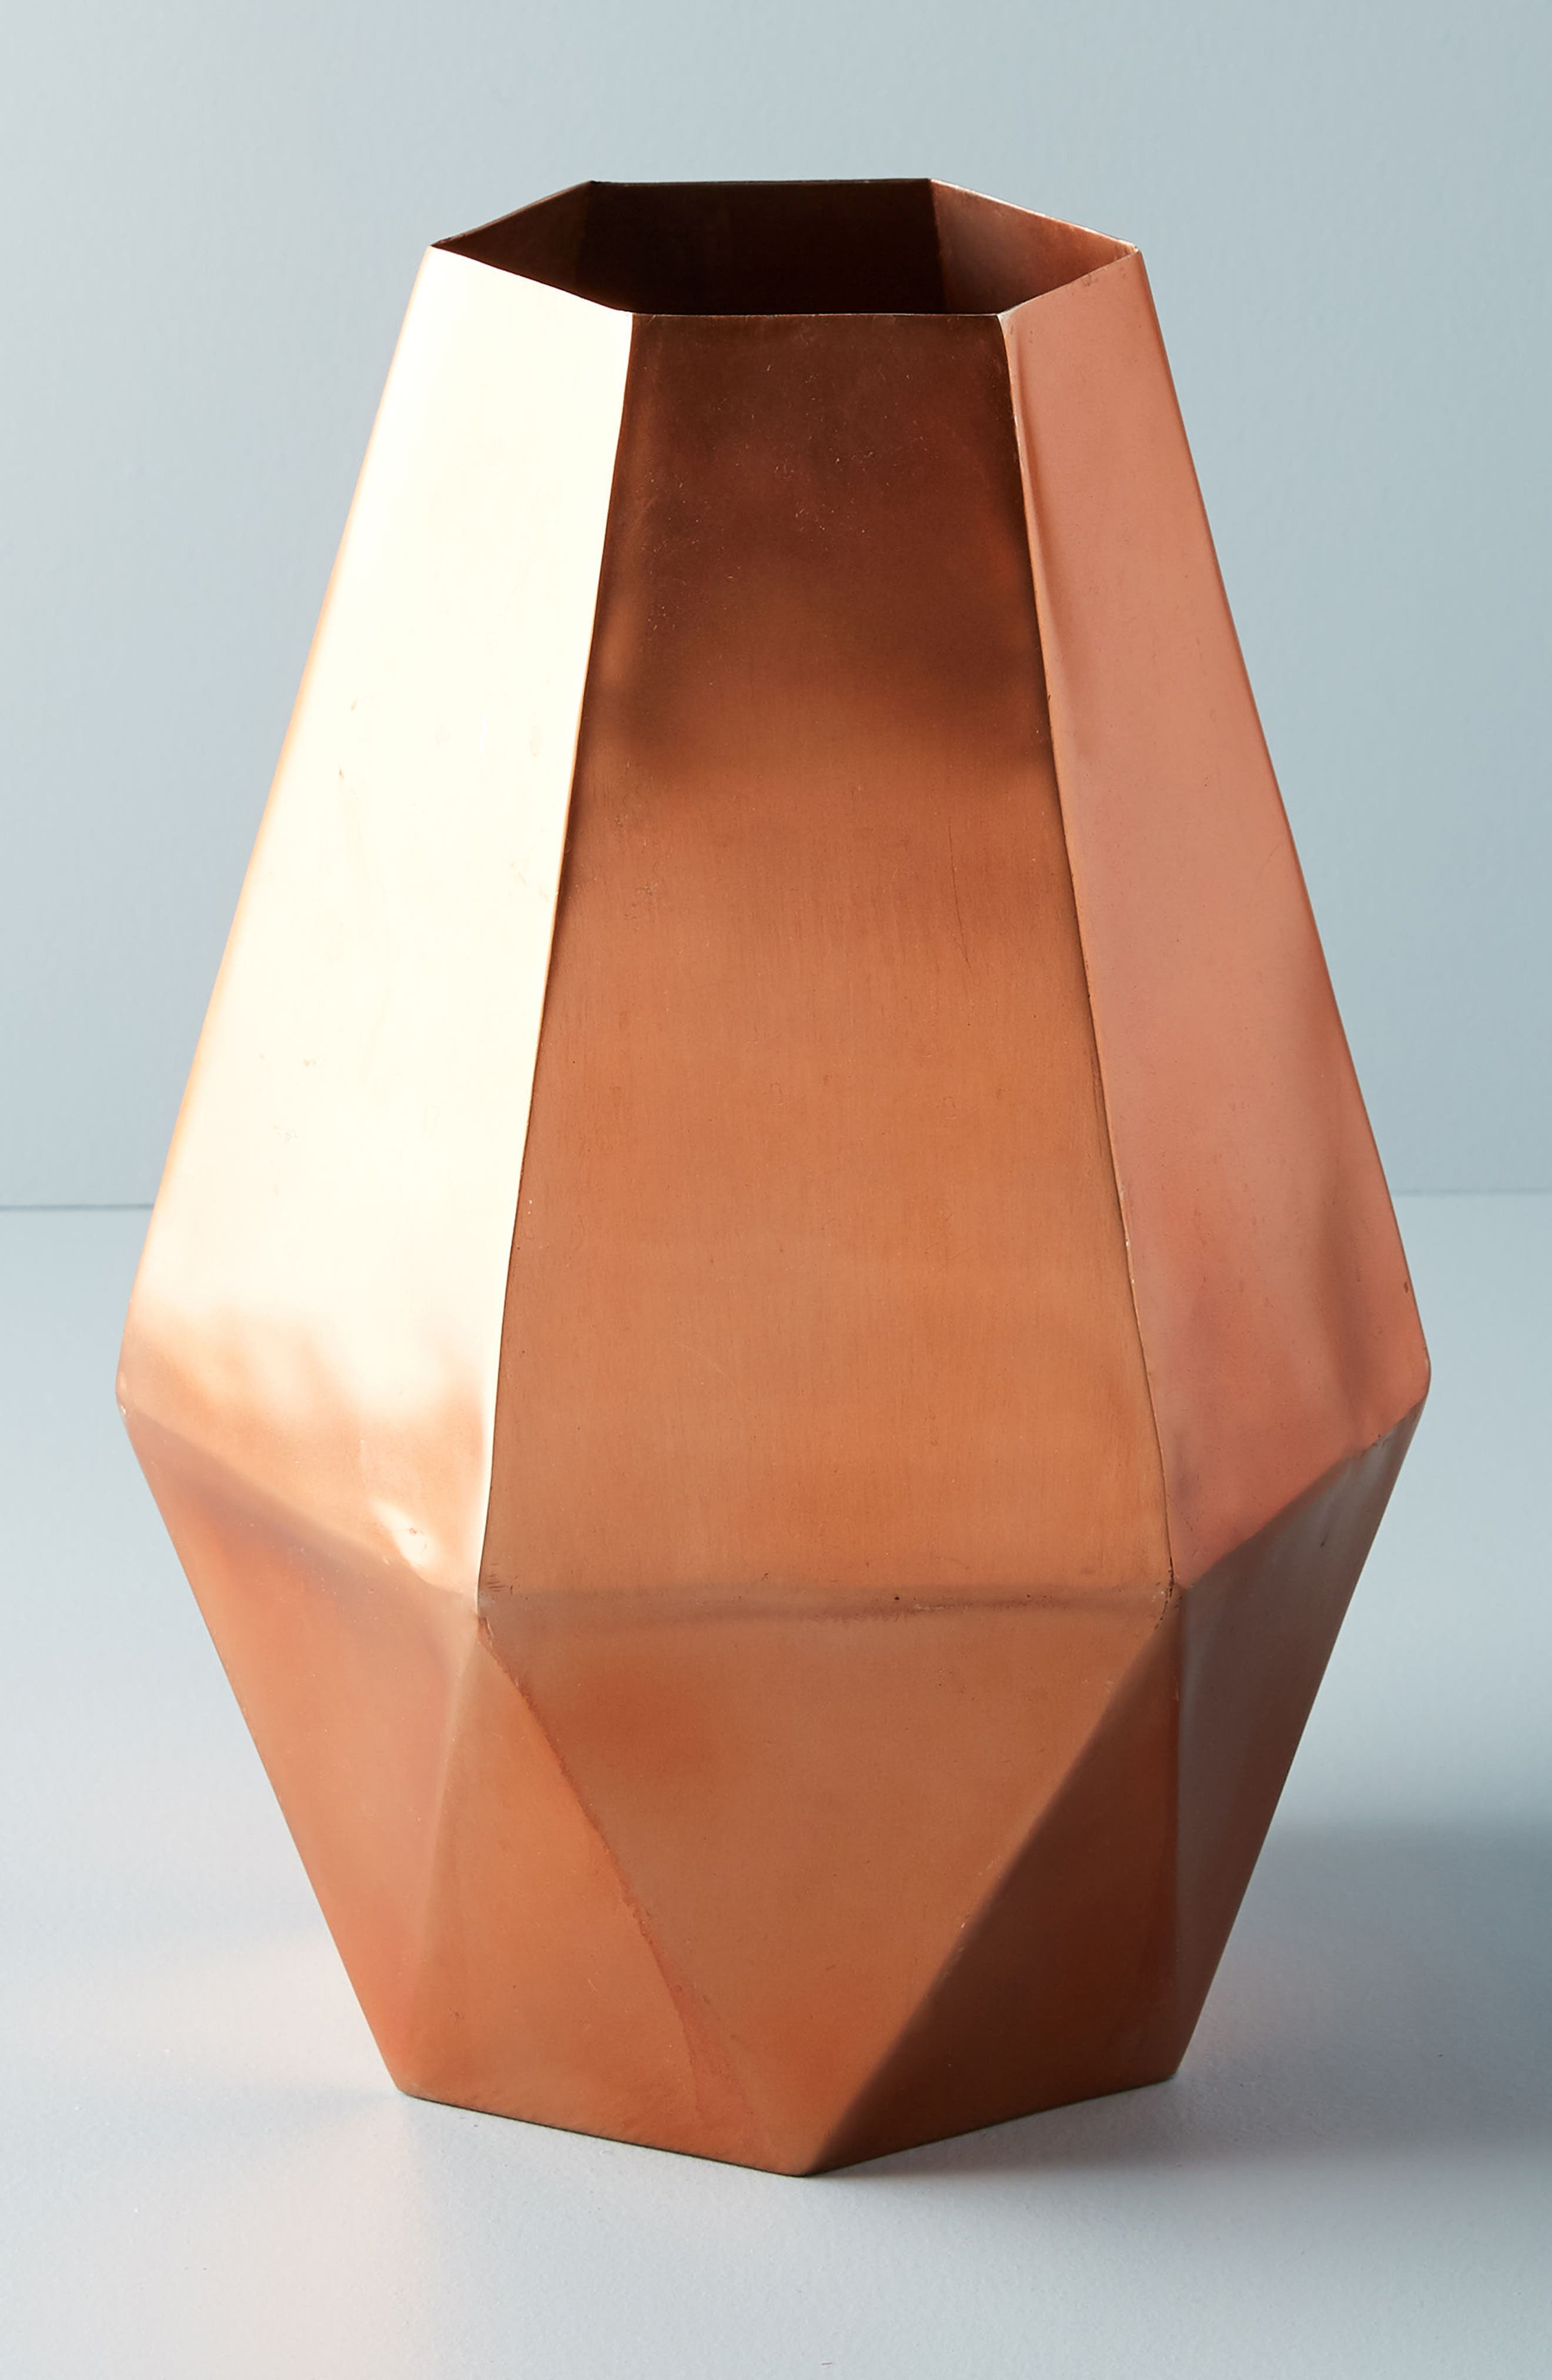 Faceted Hexagon Metal Vase,                             Main thumbnail 1, color,                             220